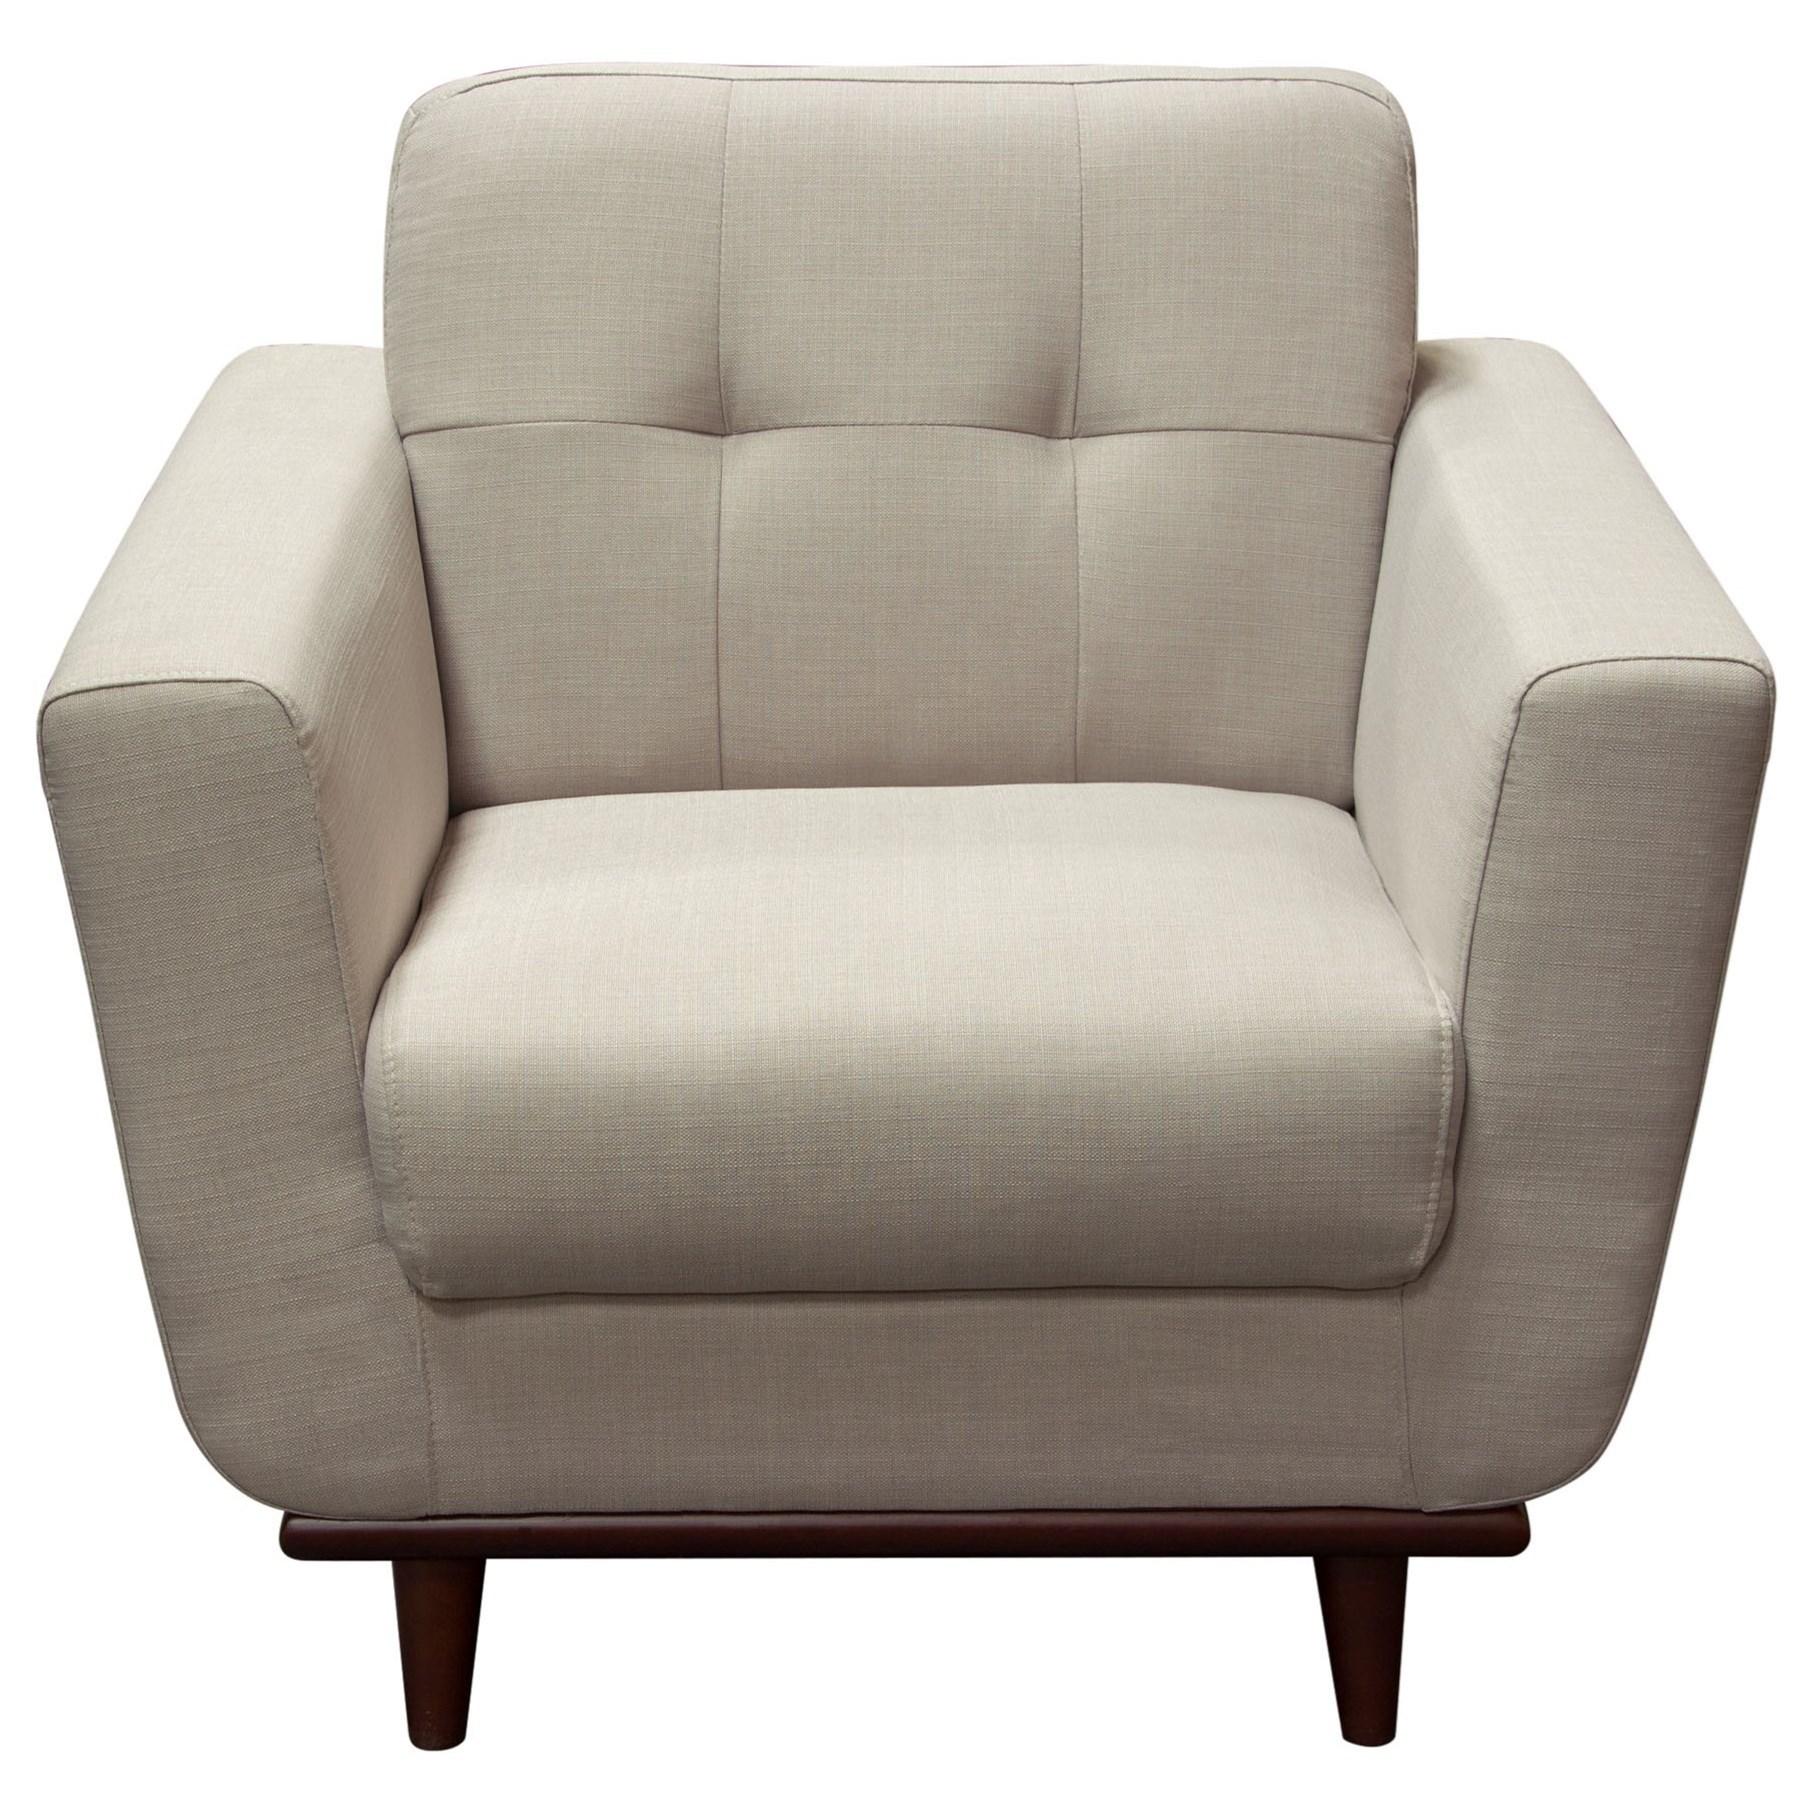 Diamond Sofa Coco Chair - Item Number: COCOCHSA